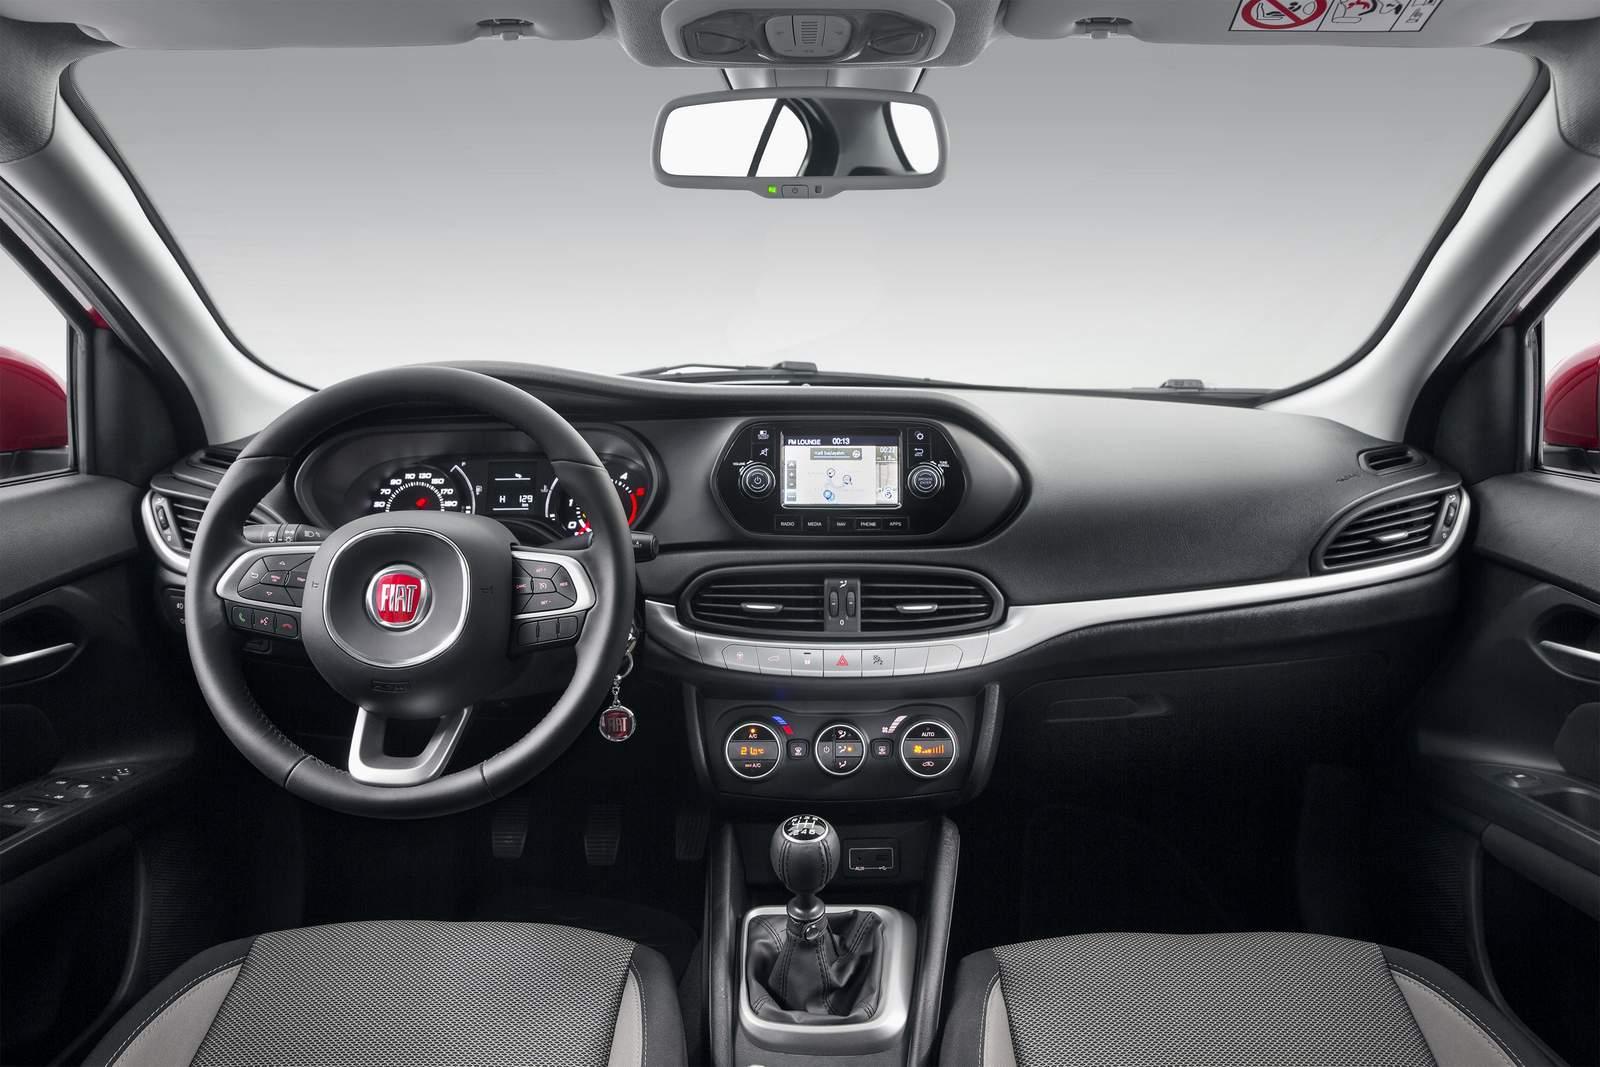 Novo Fiat Tipo 2017 SW